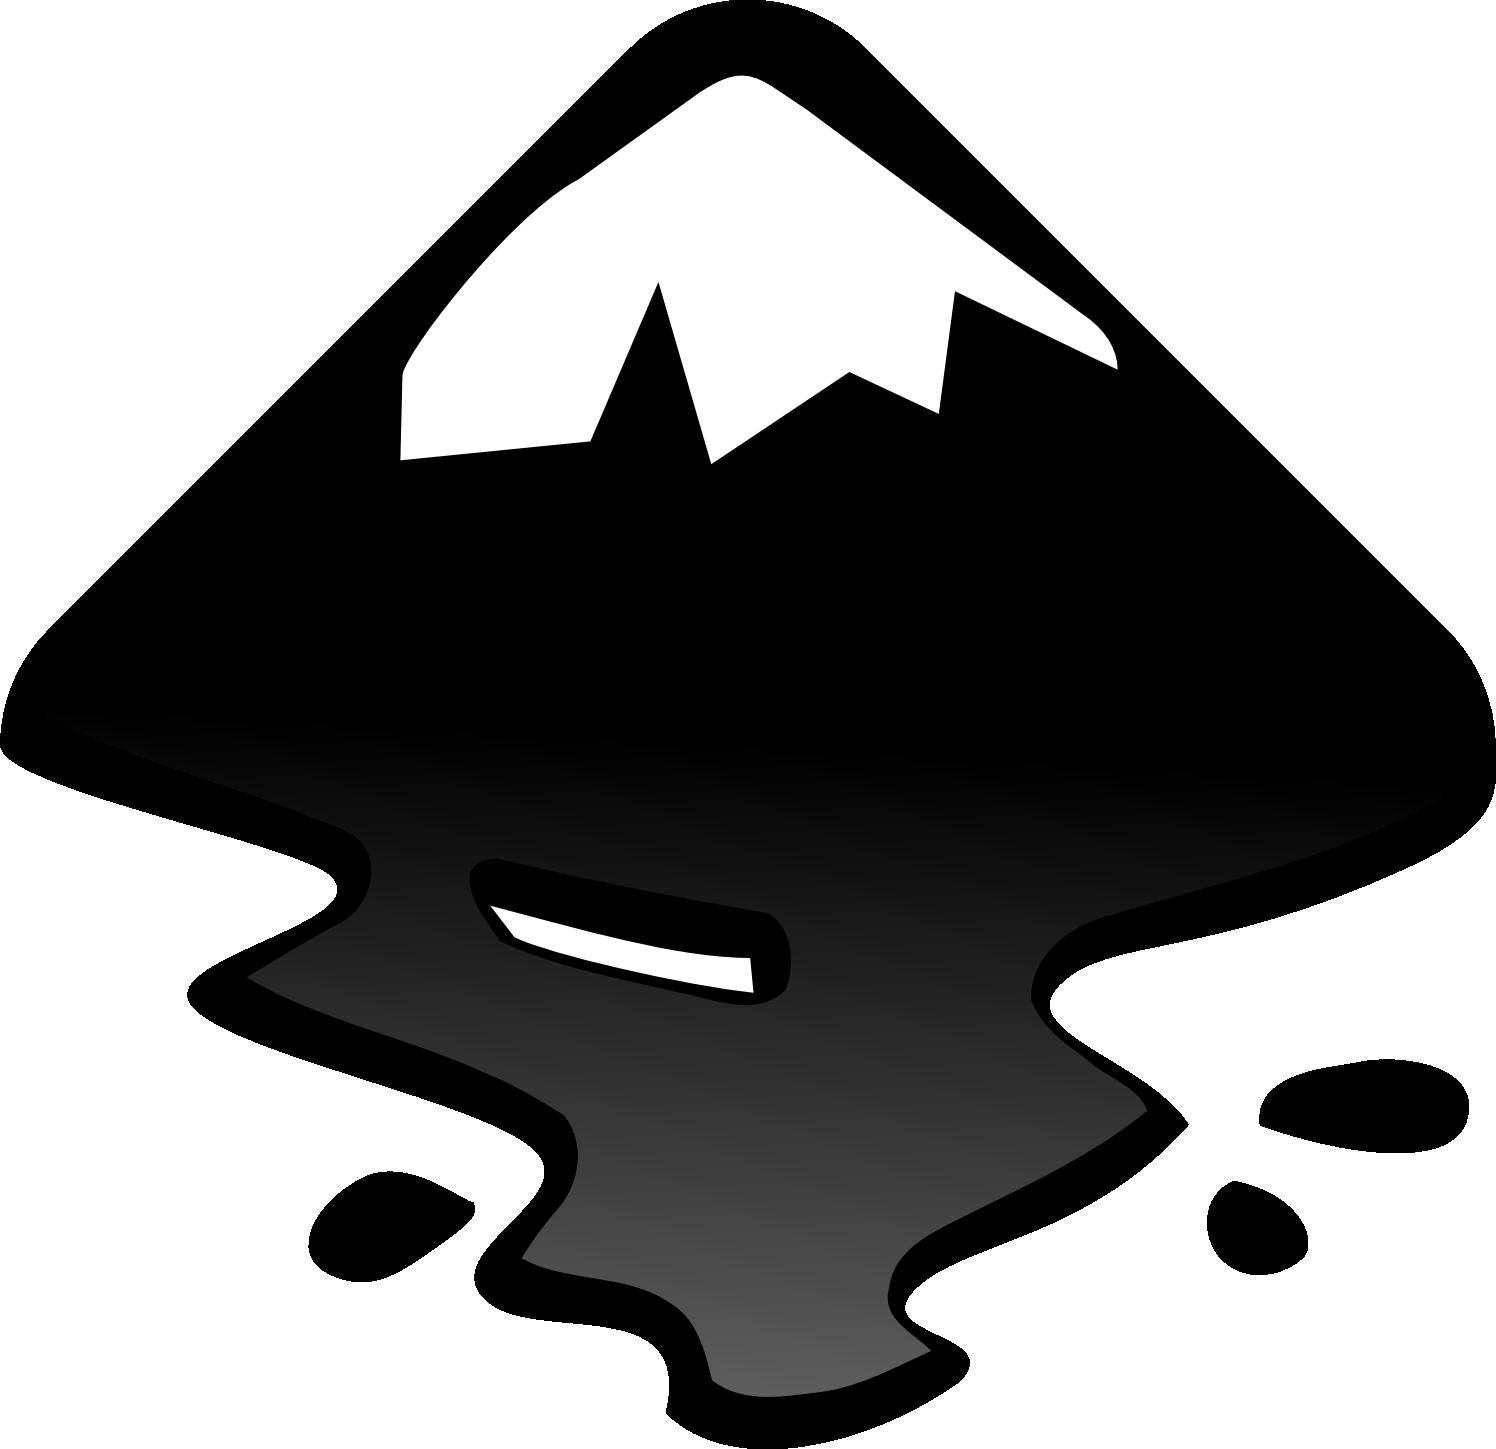 png freeuse download Free alternatives to best. Drake vector illustrator.